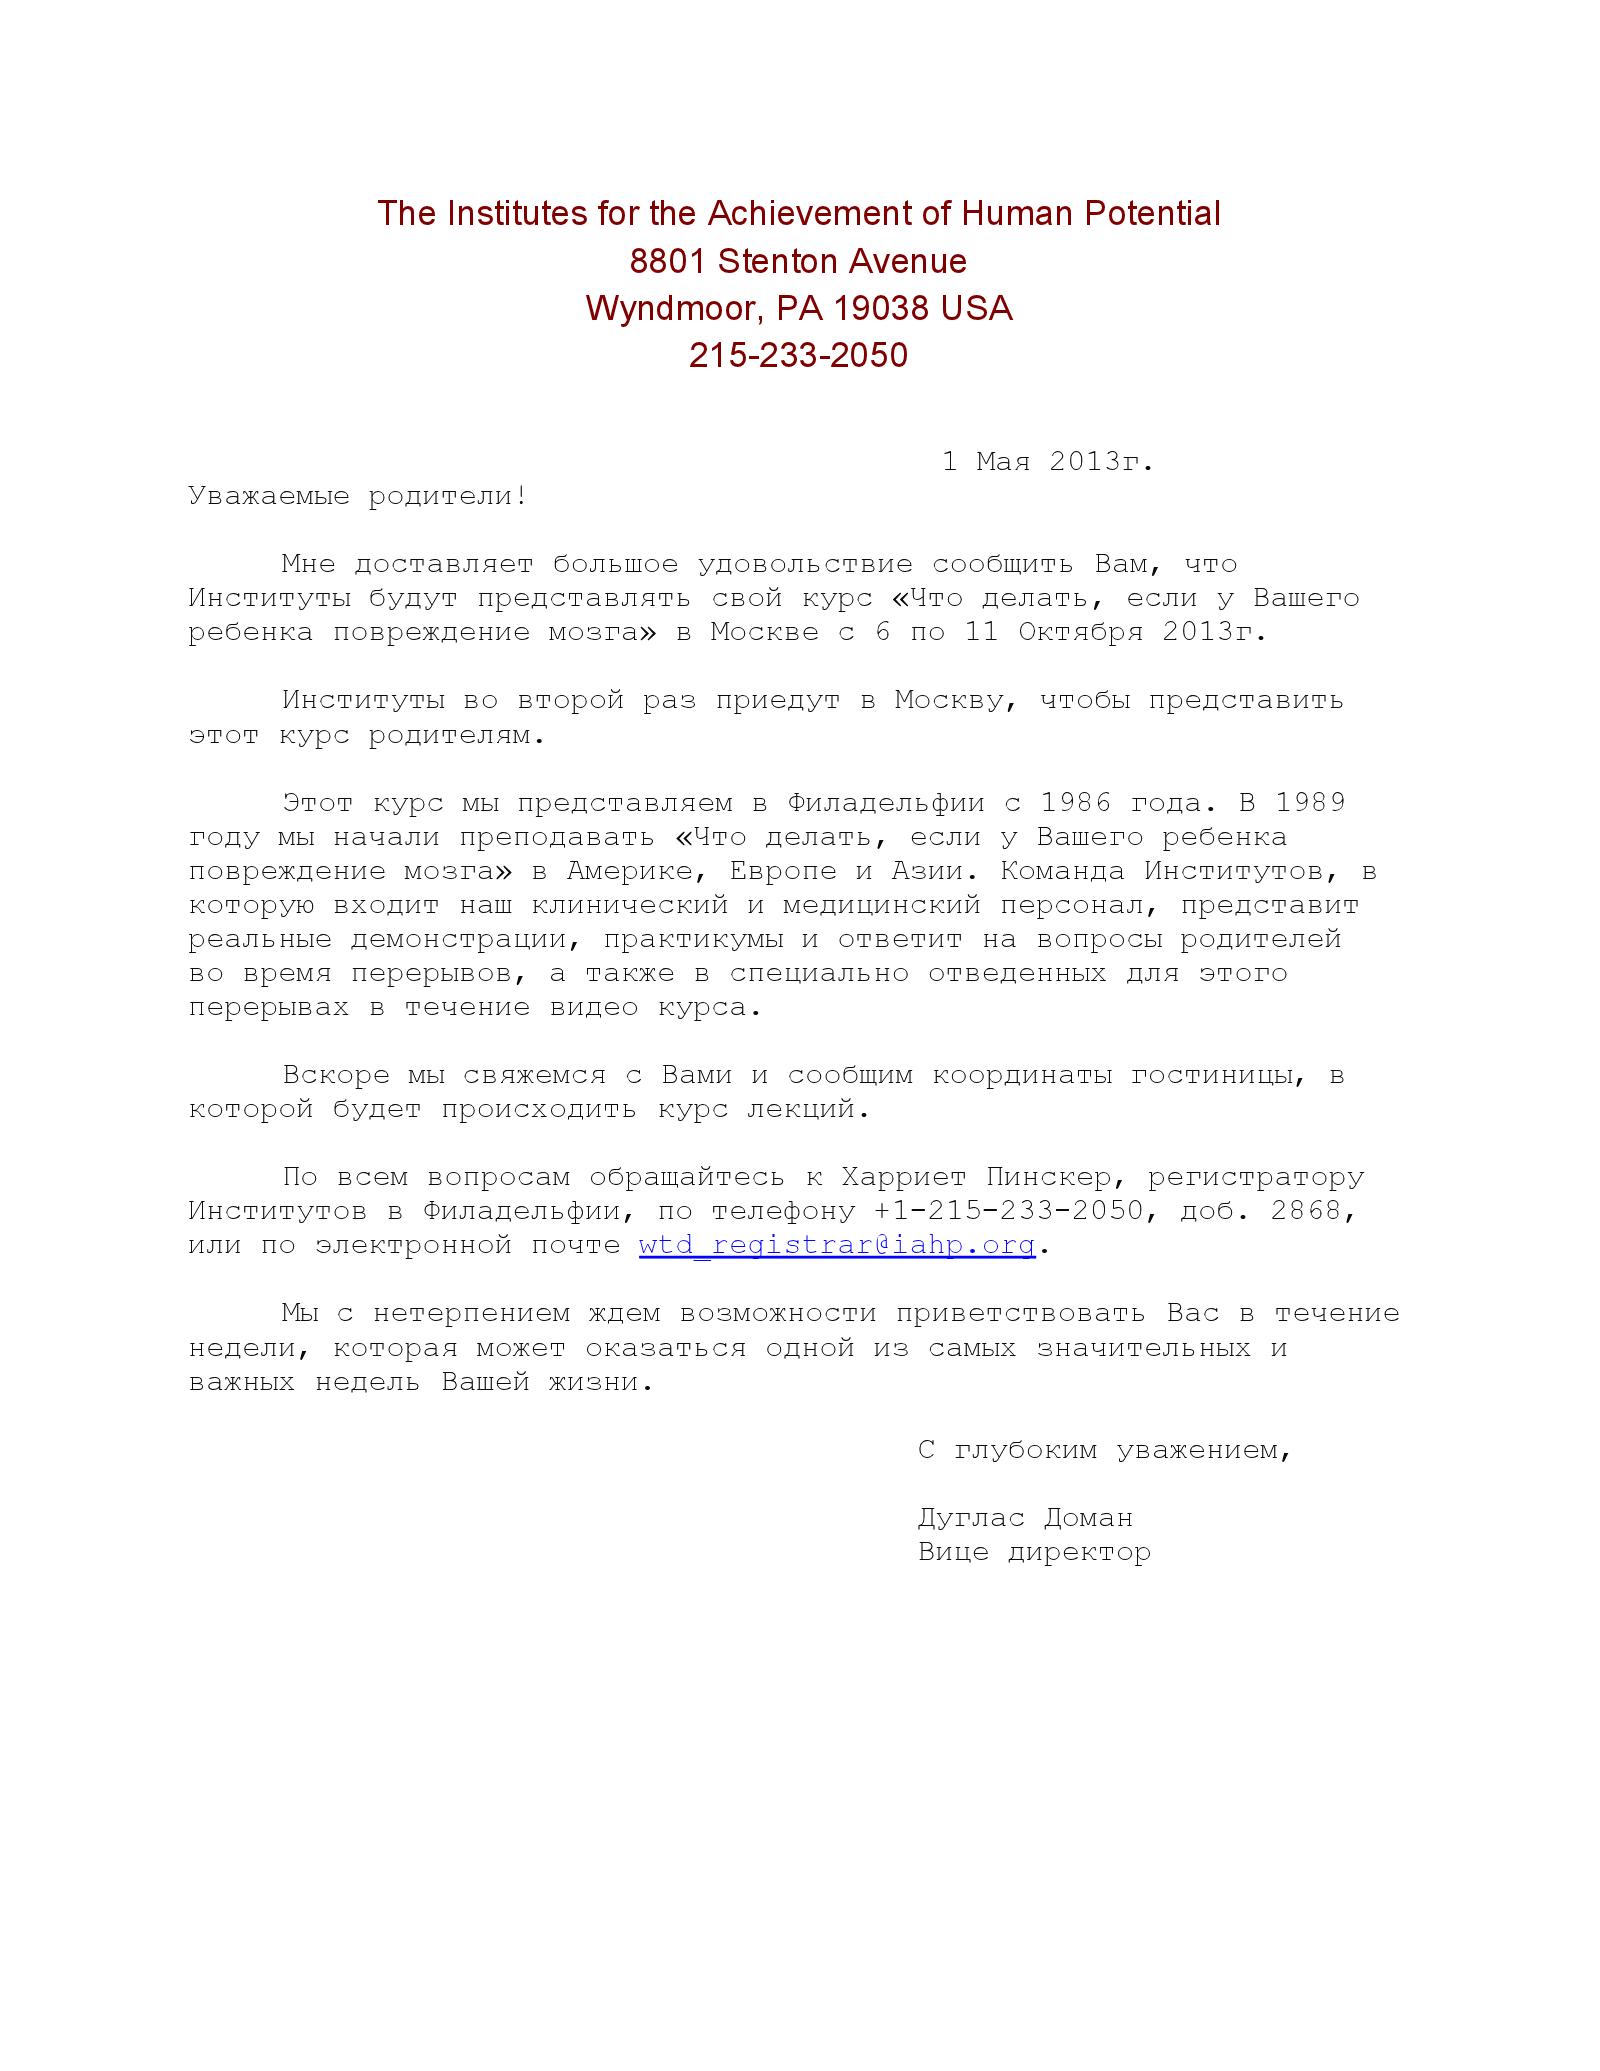 Письмо Дагласа Домана